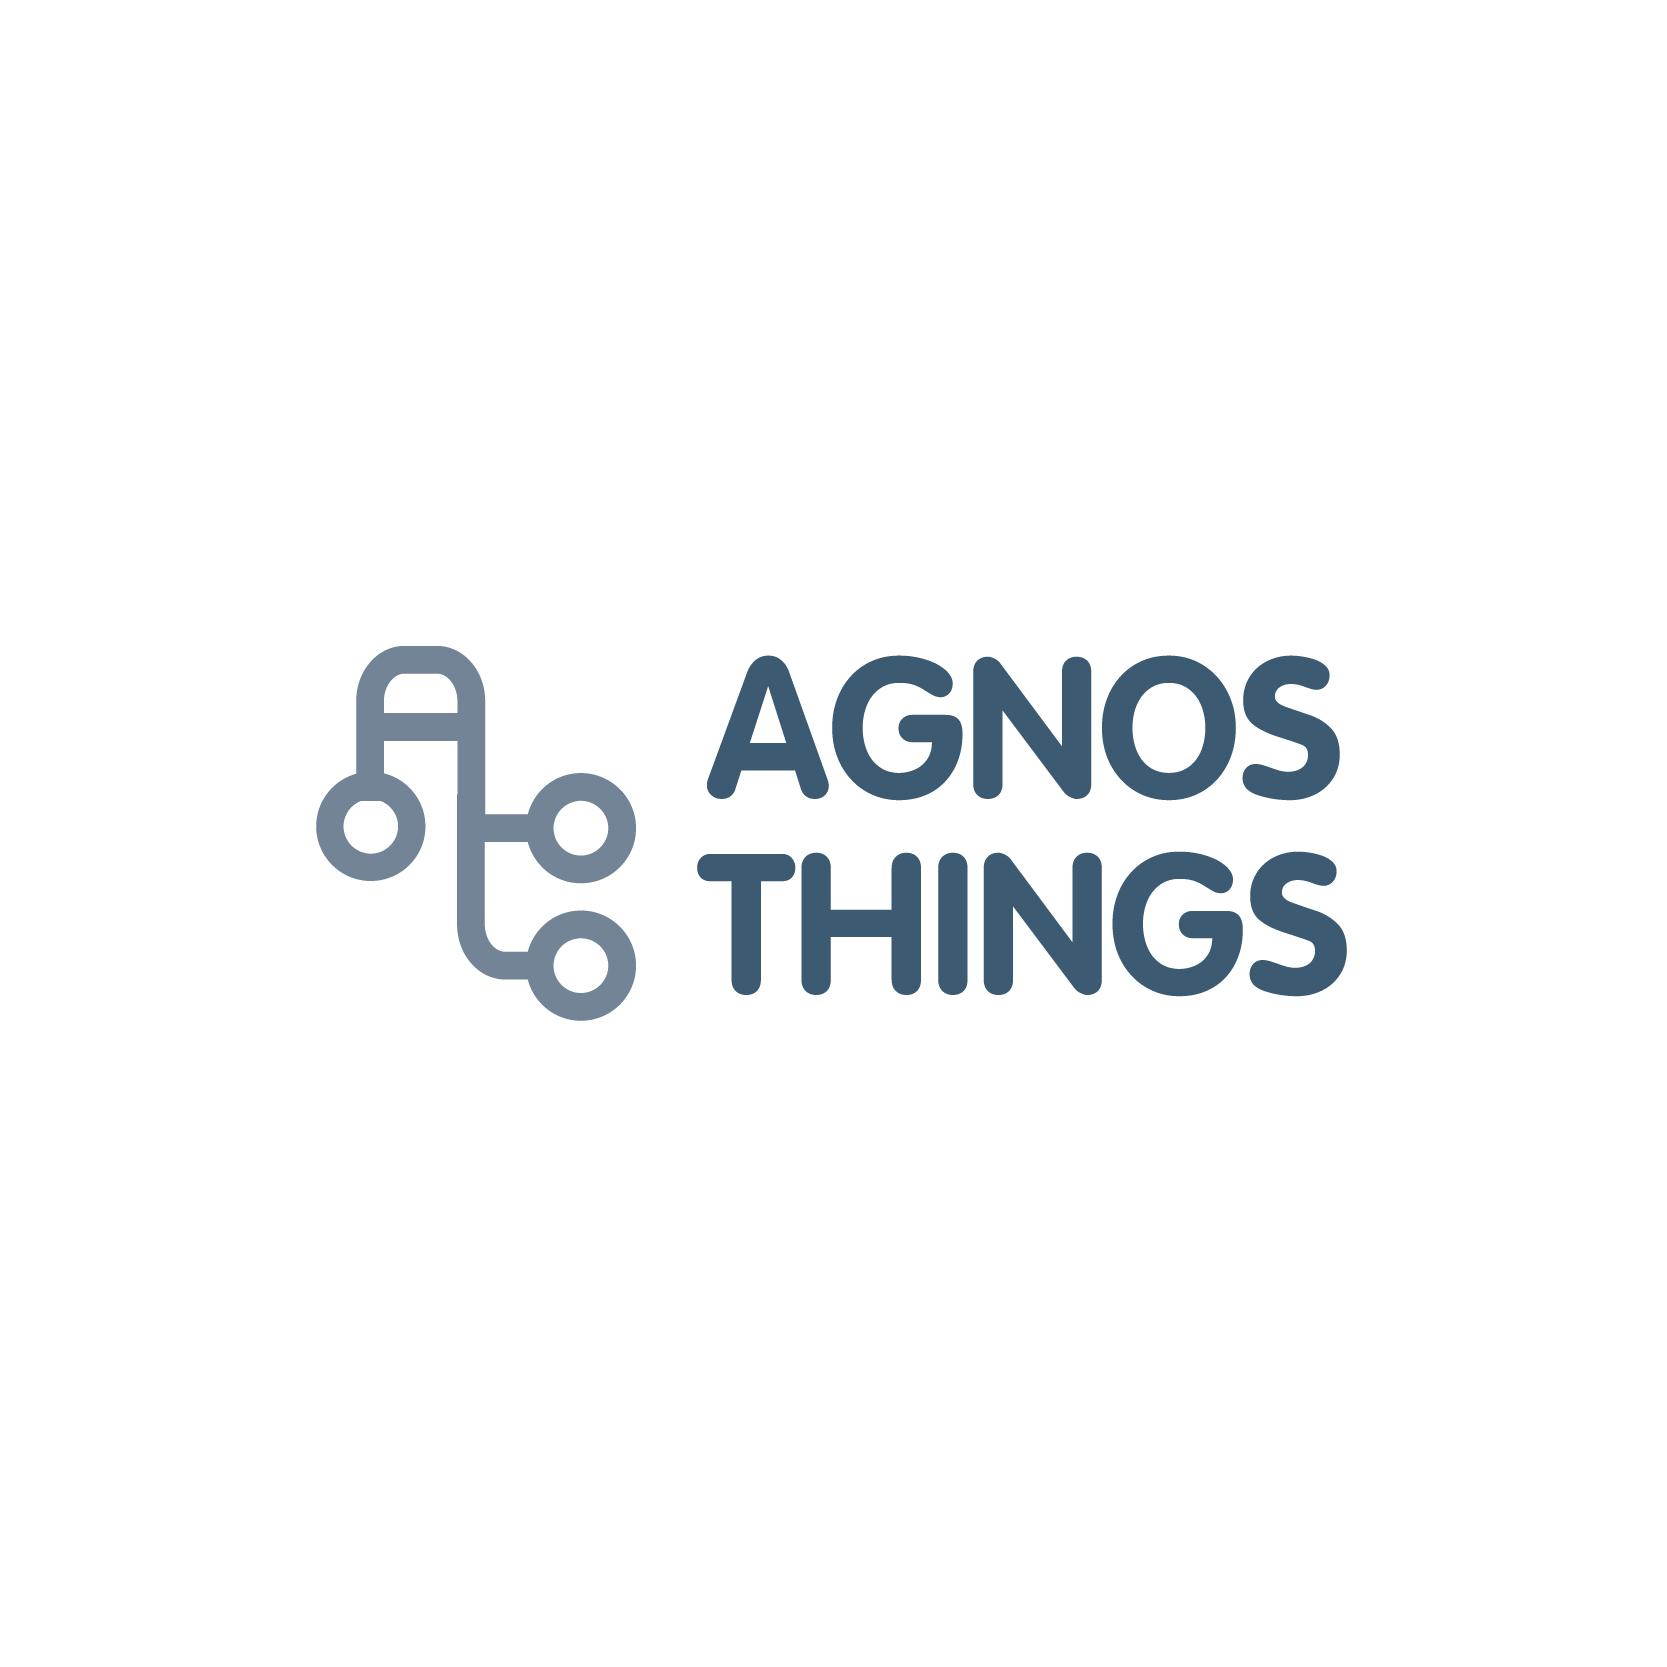 AgnosThings Bandung Developer Meetup